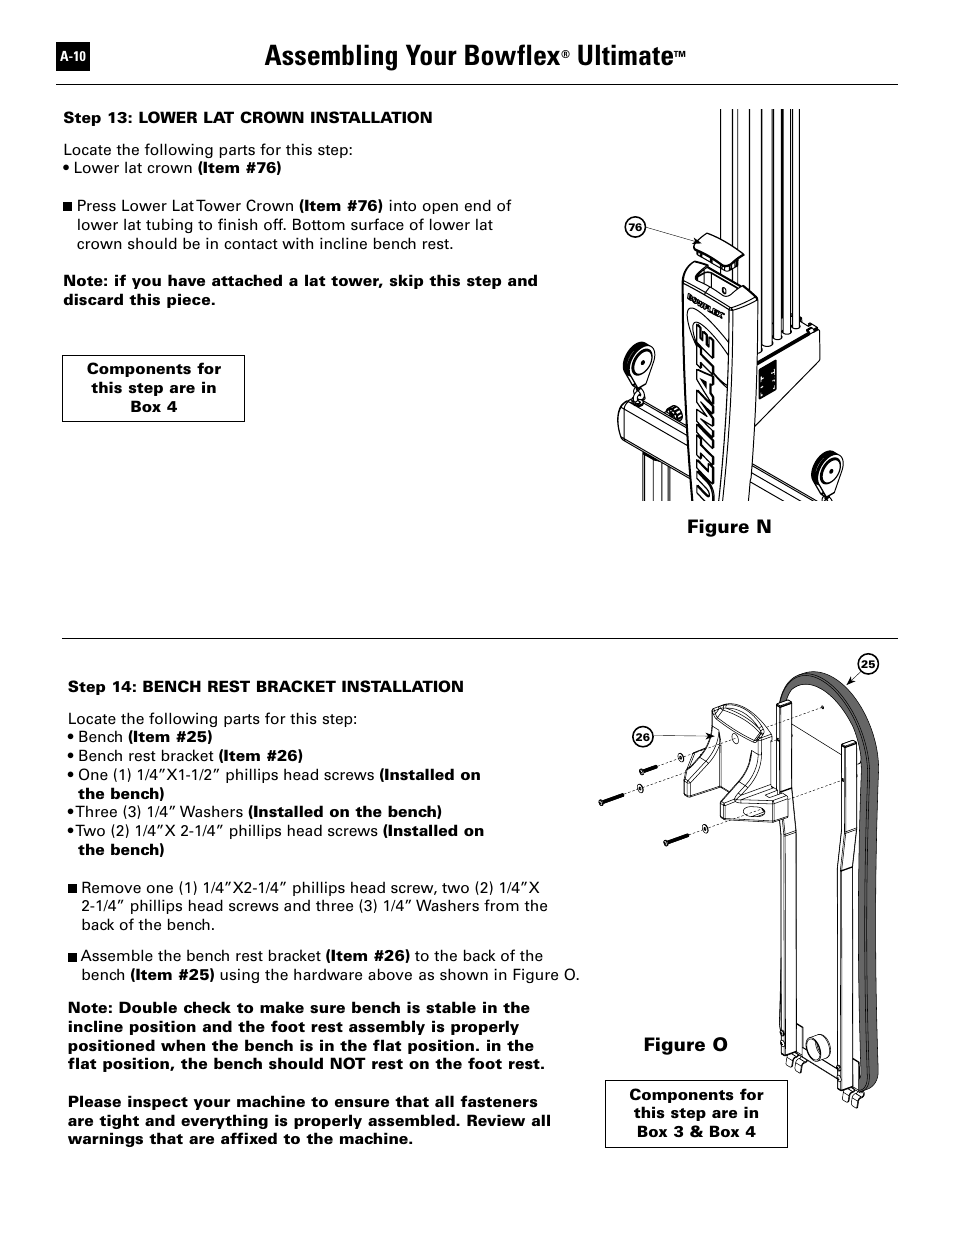 assembling your bowflex ultimate bowflex ultimate user manual rh manualsdir com Bowflex Adjustable Dumbbells Bowflex SelectTech Adjustable Bench Series 3 1